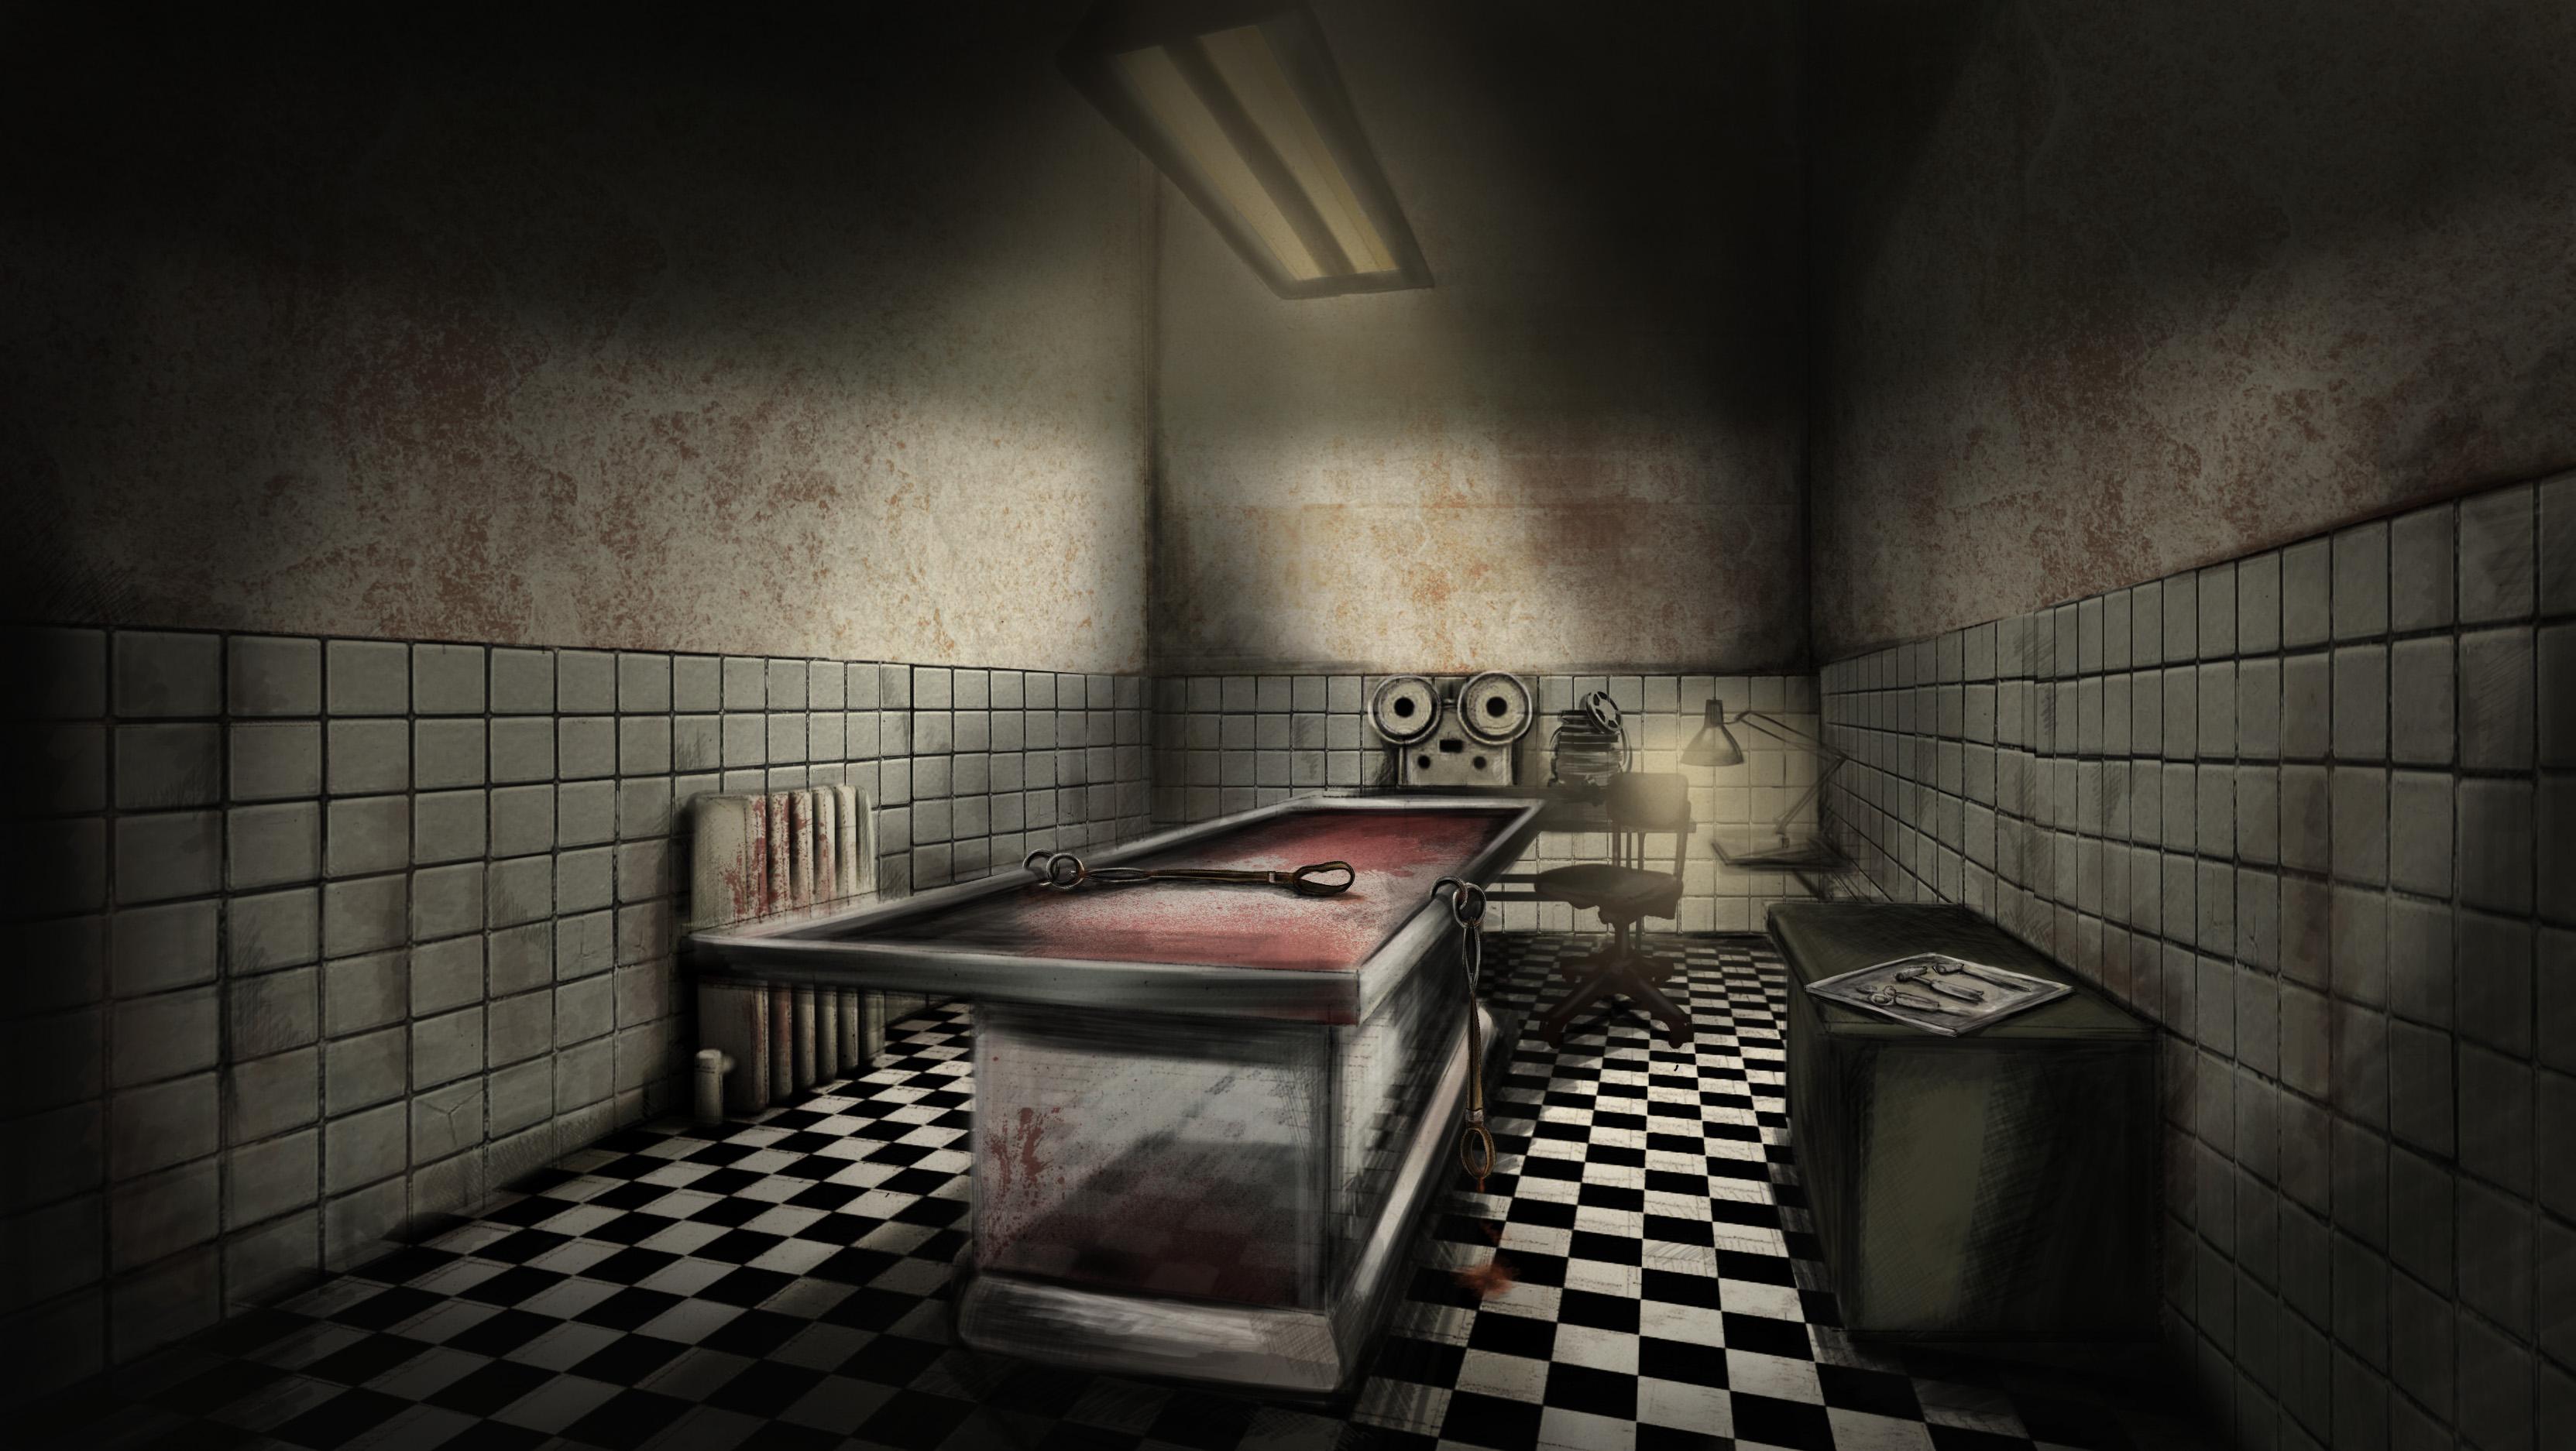 interior_asylum_ammended